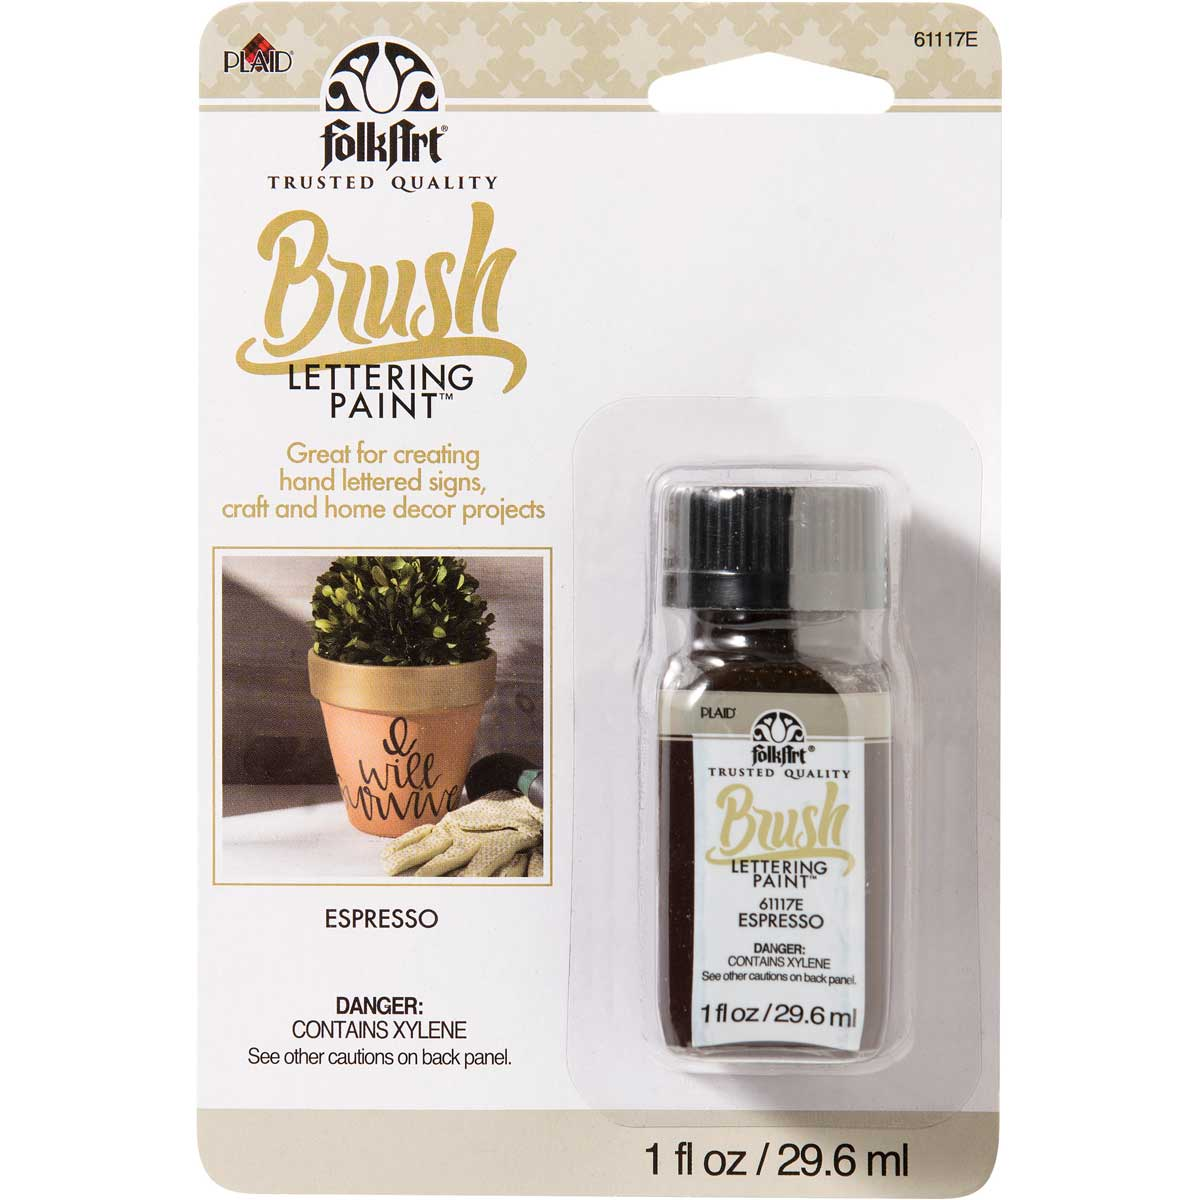 FolkArt ® Brush Lettering Paint - Espresso, 1 oz.